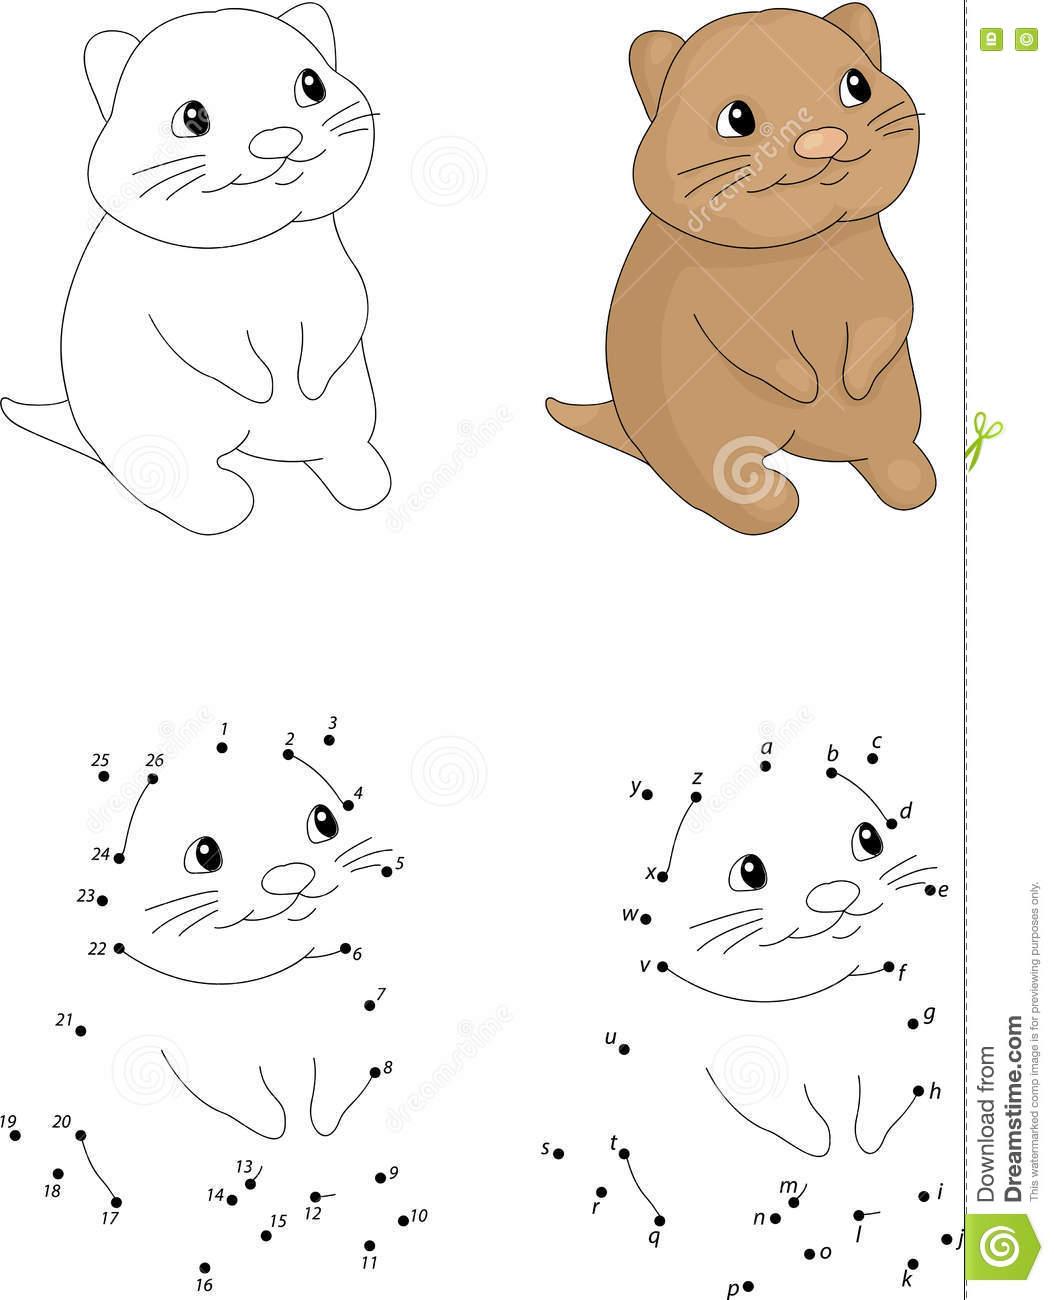 Quokka coloring #4, Download drawings